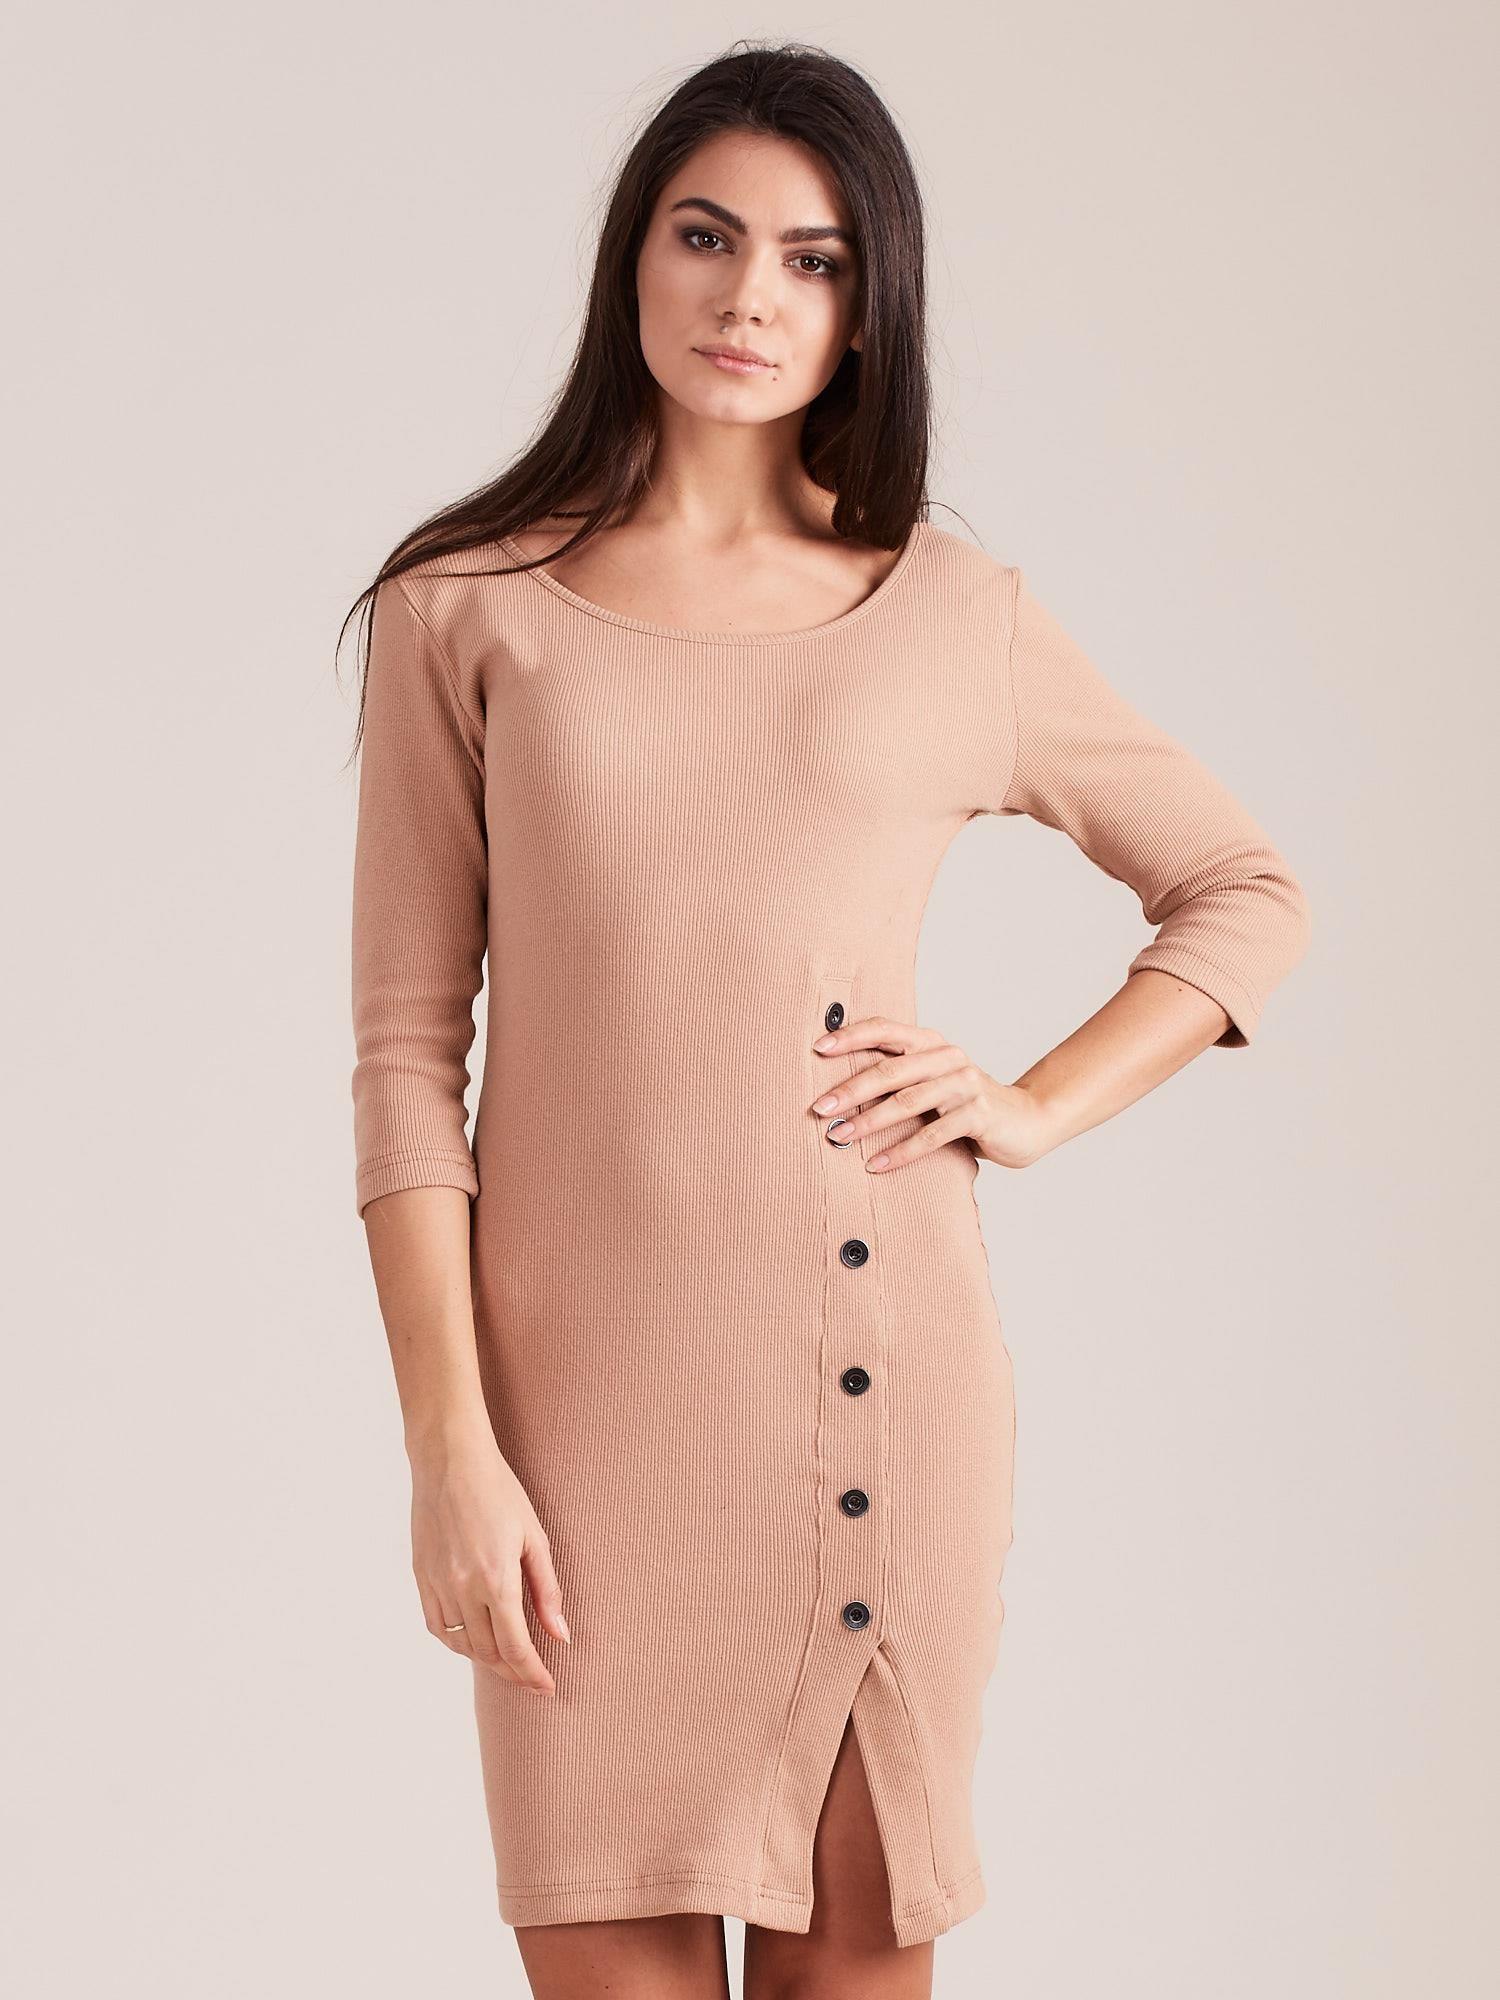 Dámske tmavobéžové šaty s rozparkom - M